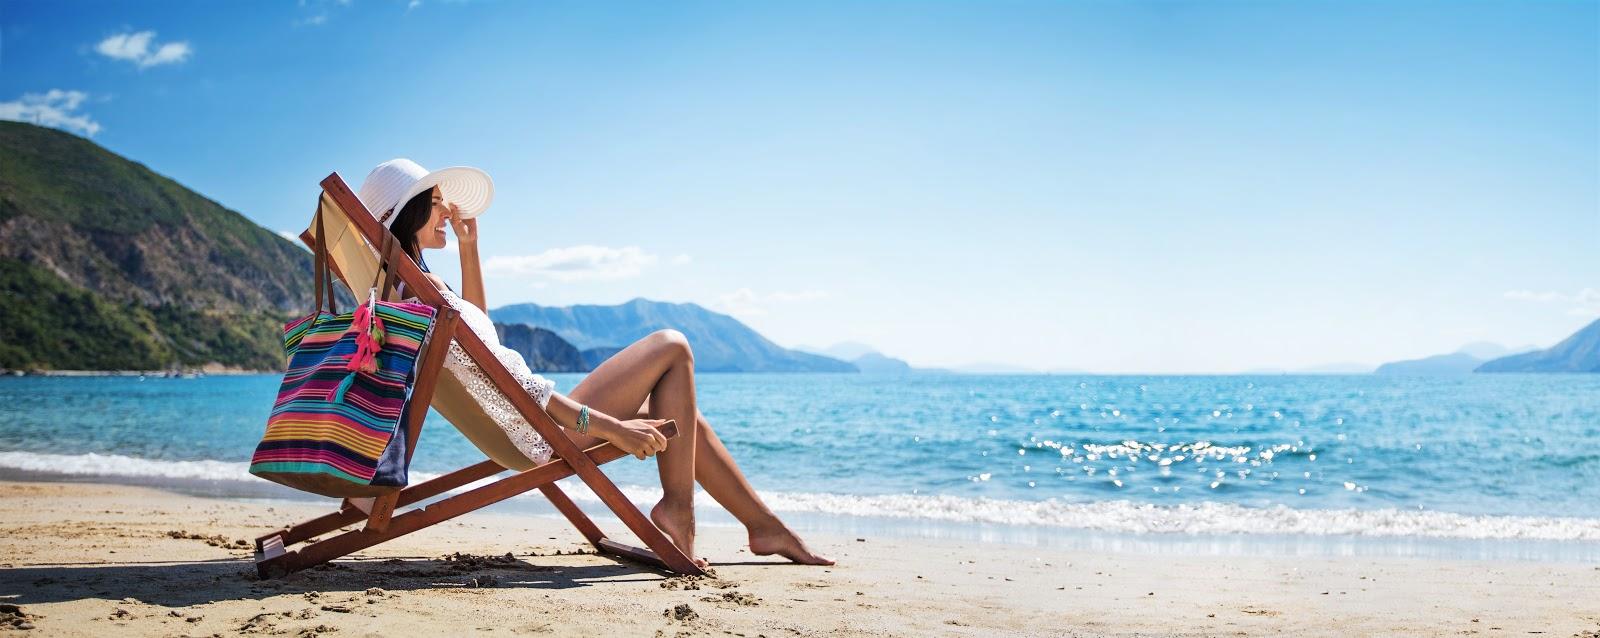 A woman relaxing on a beautiful beach